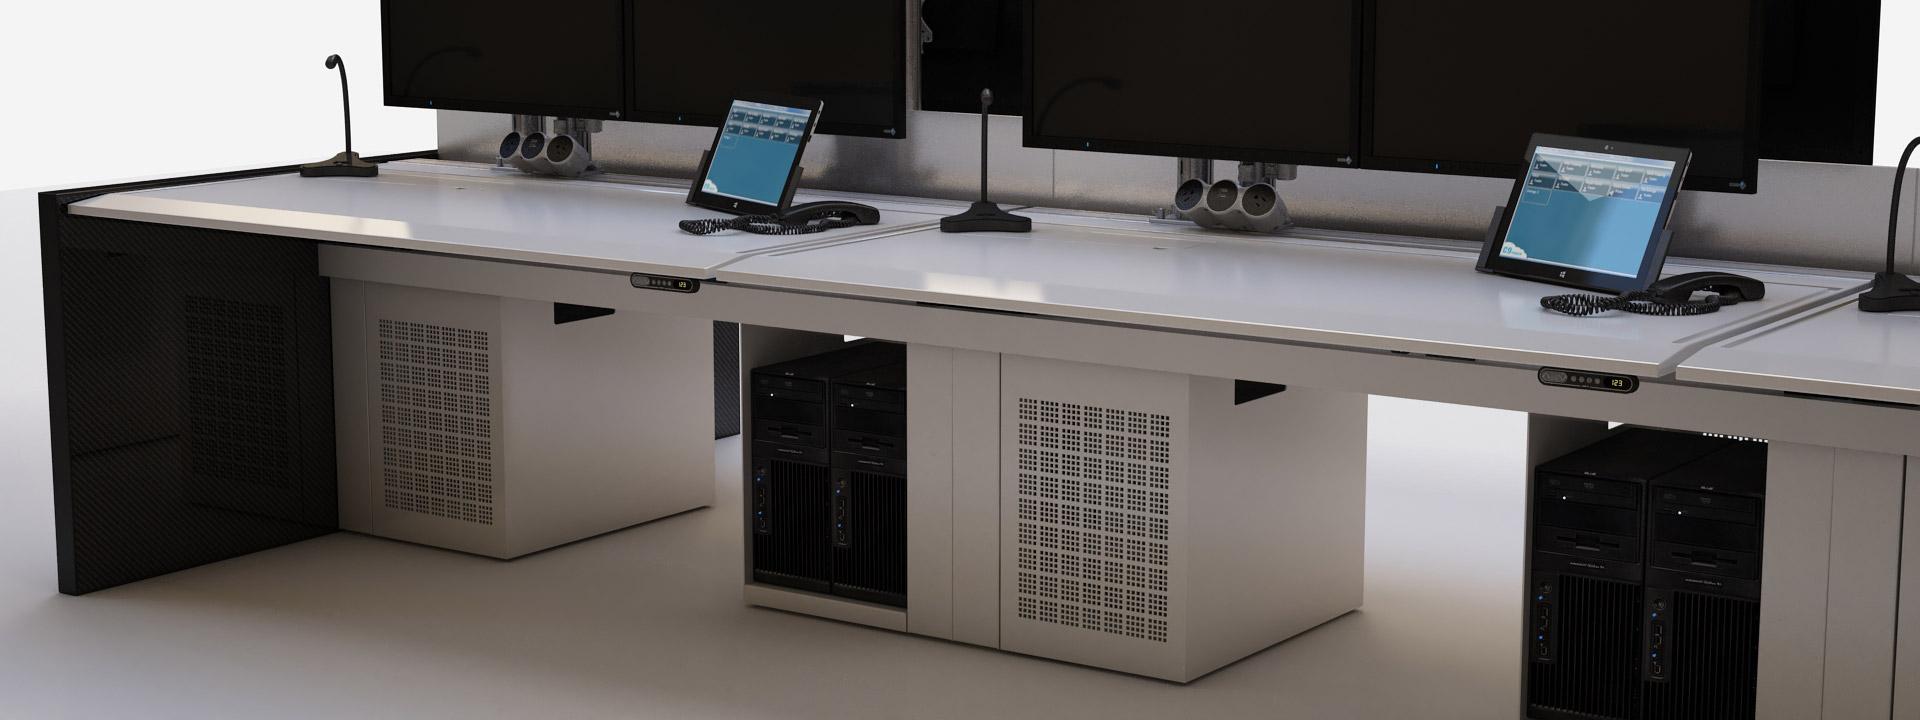 NEO Trading Desk